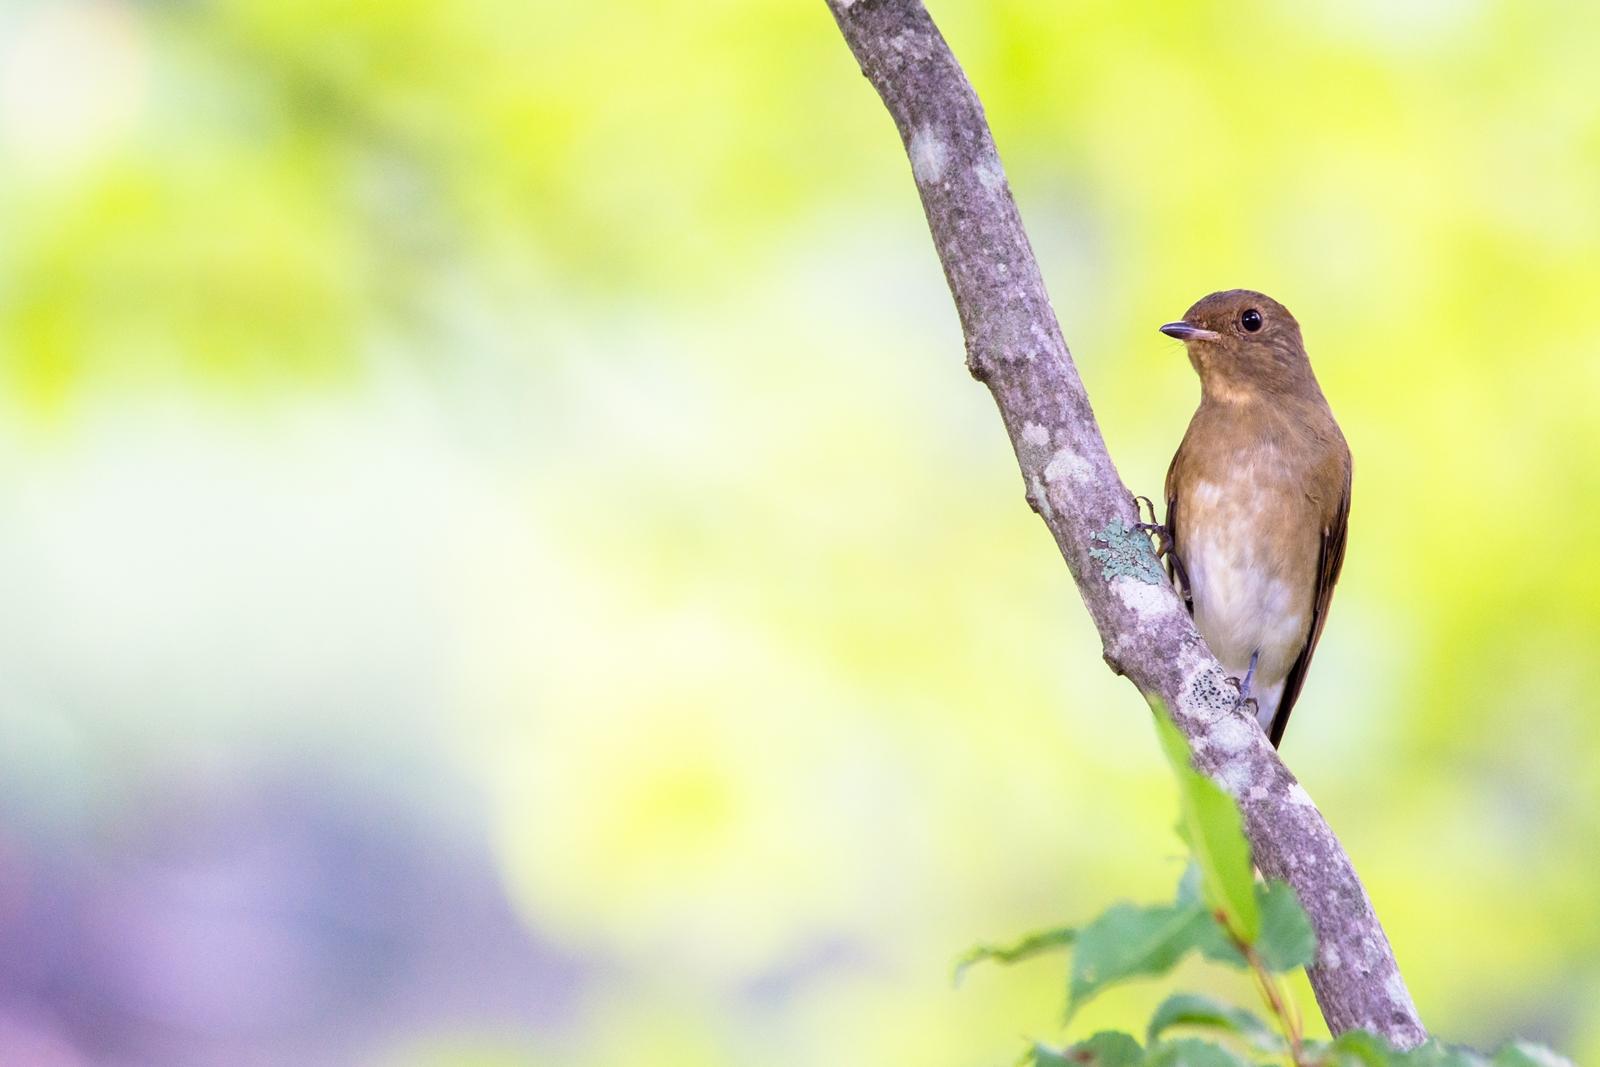 Photo: 緑の季節の輝き Glow of green season.  緑で包まれ 生命であふれた季節 あの輝きを記憶に残し 次の季節へと受け継いでゆく  Blue-and-White Flycatcher. (オオルリ・雌) 少し見分けが難しいので 間違っていたらすみません。  #birdphotography #birds #cooljapan #kawaii #nikon #sigma  Nikon D7200 SIGMA 150-600mm F5-6.3 DG OS HSM Contemporary